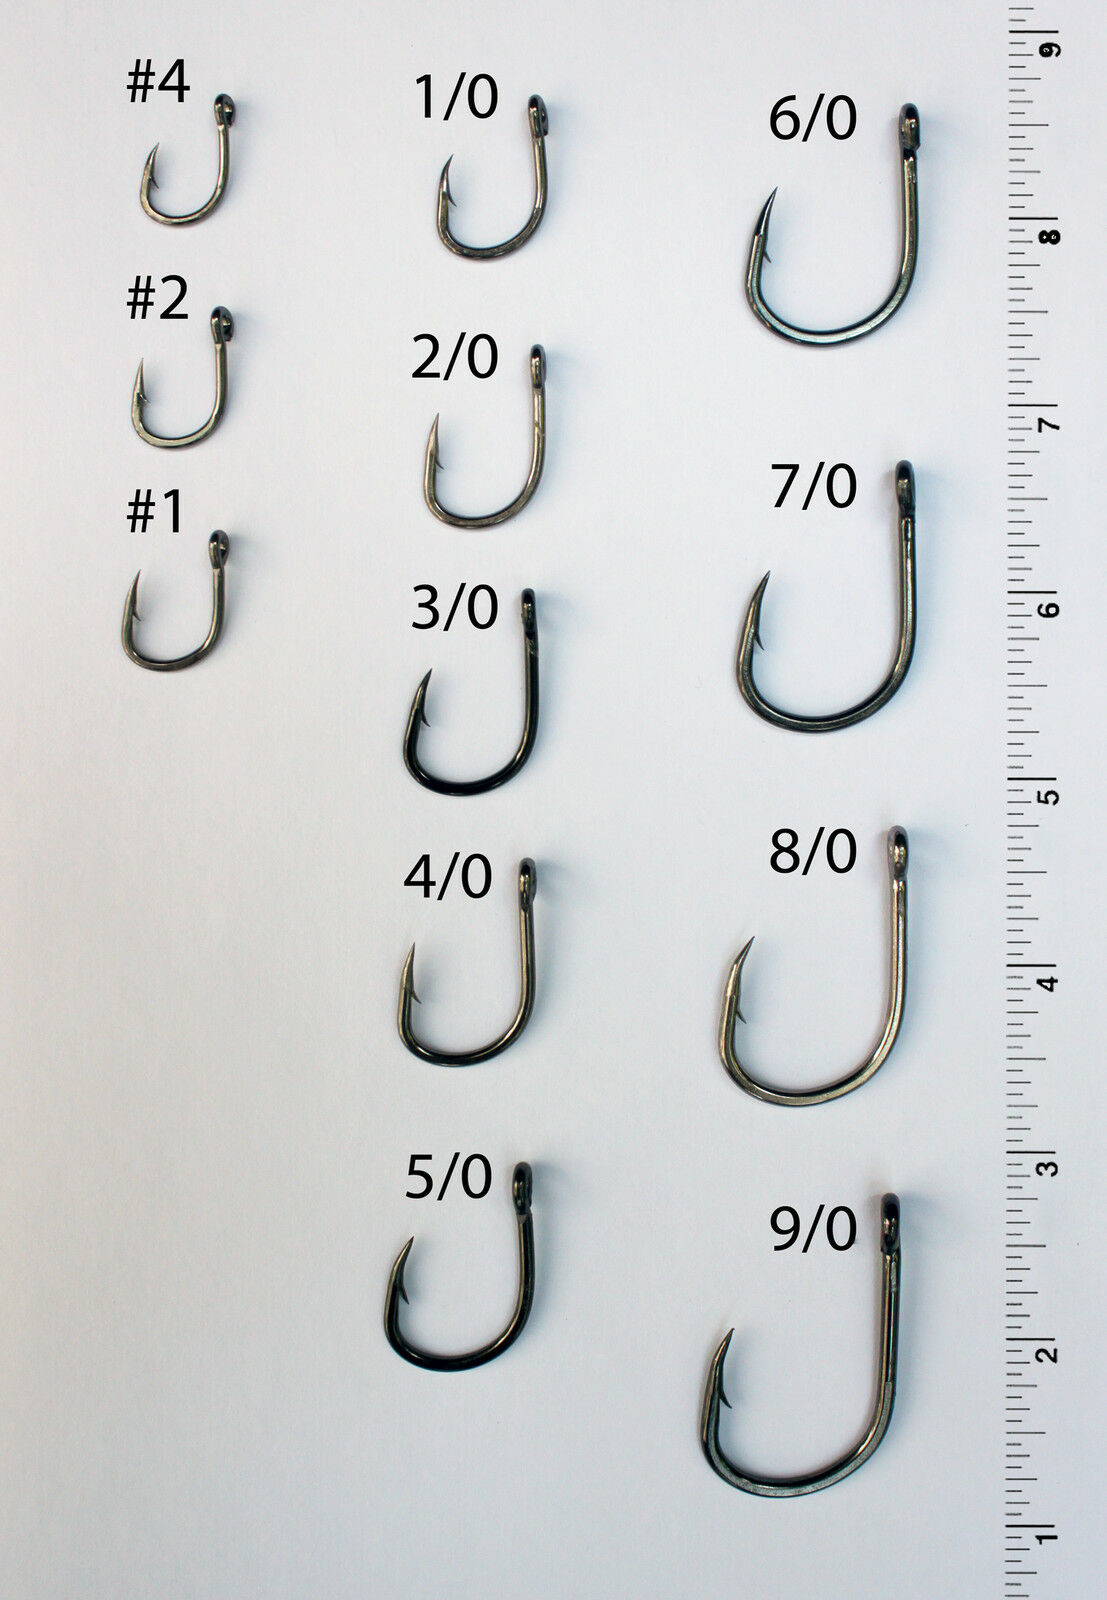 1000 Größe 10/0 4x Strong Custom Offshore Live Live Live Bait Hooks L319 4dc68e